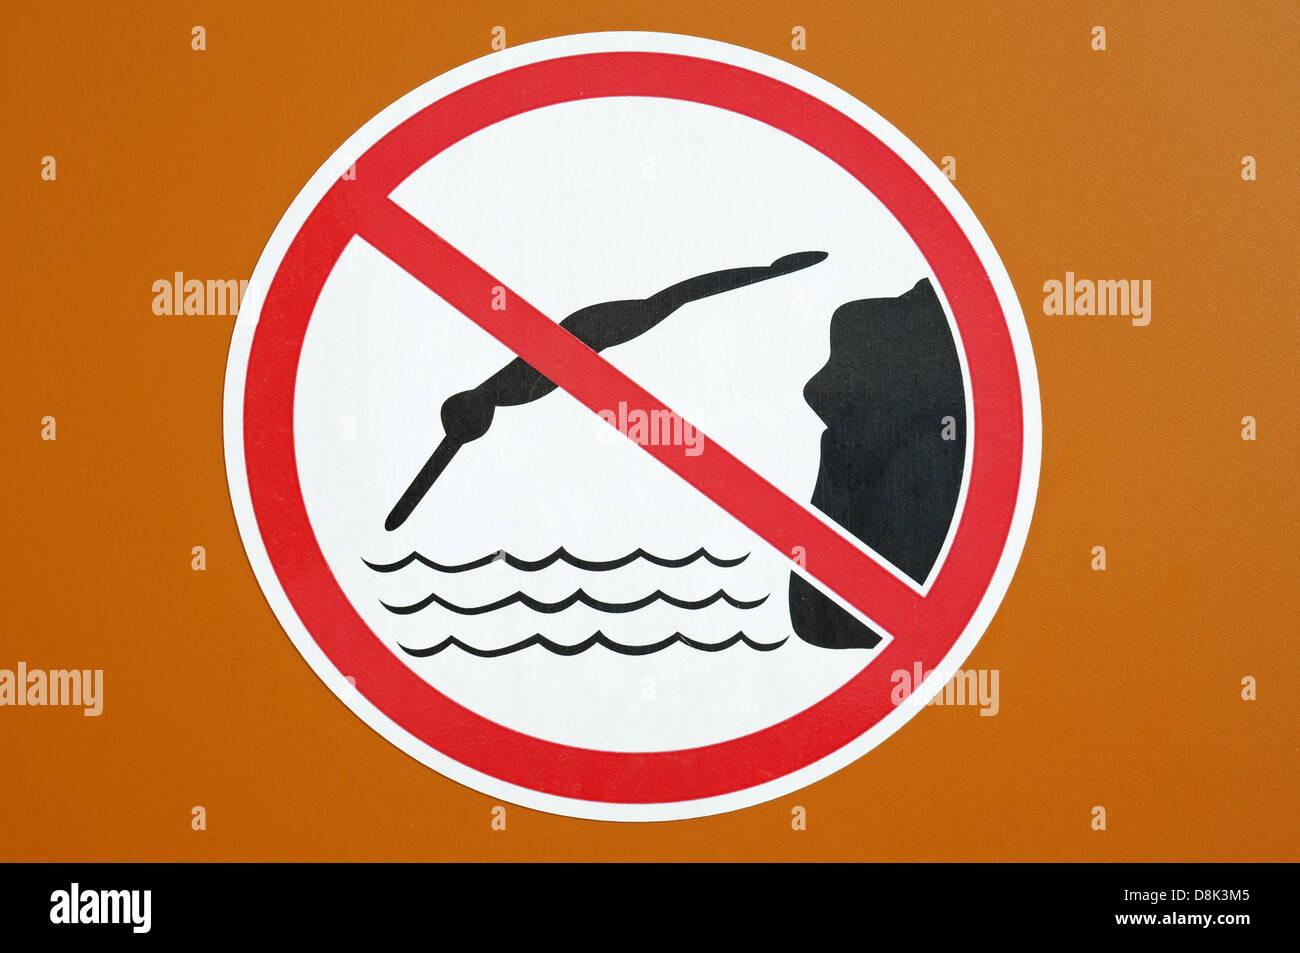 ins Wasser springen verboten - Stock Image